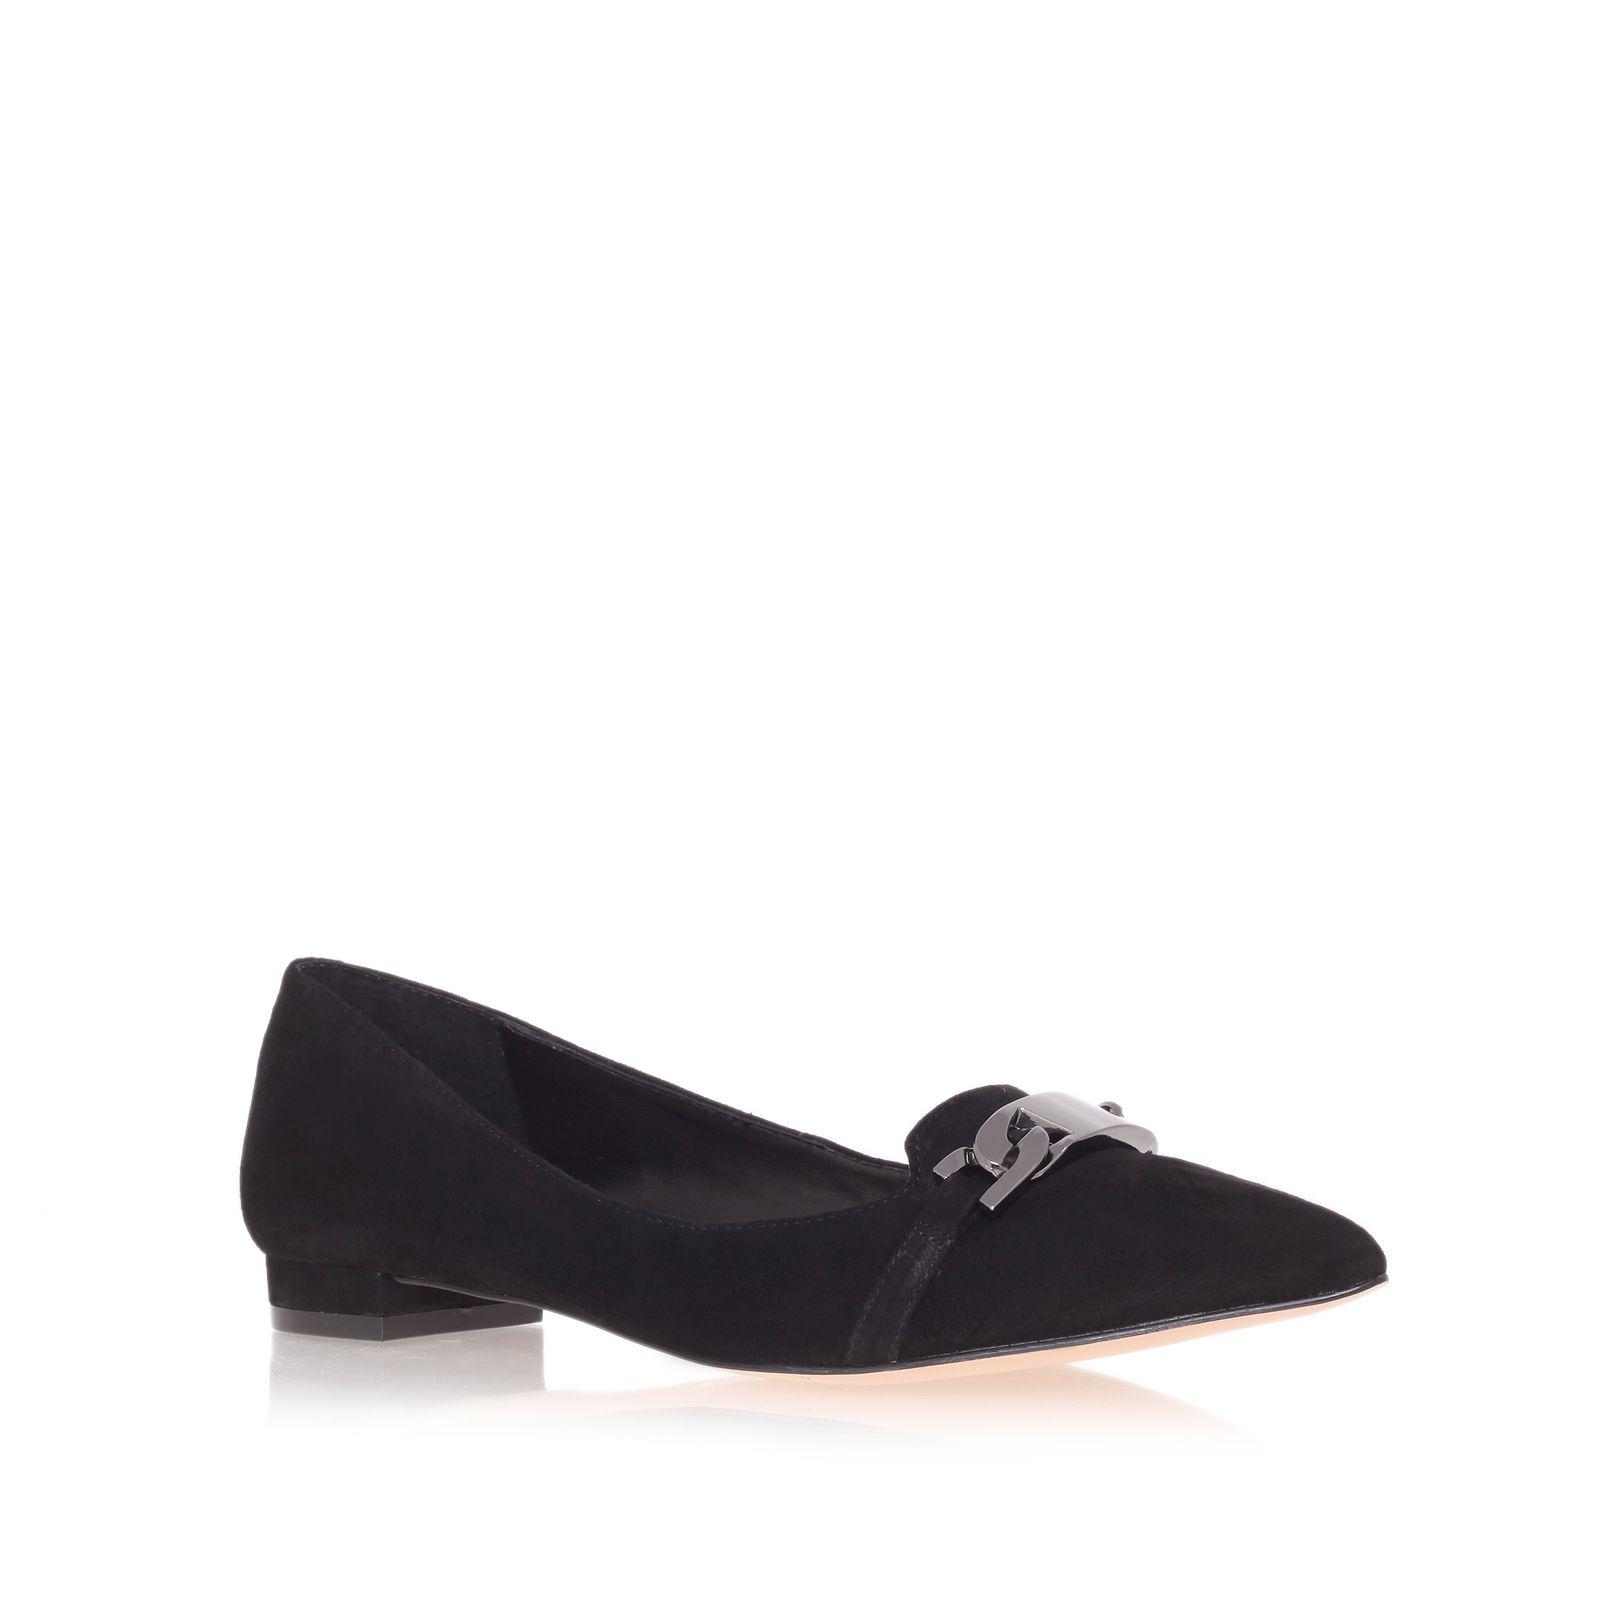 carvela kurt geiger linked slipper shoes in black lyst